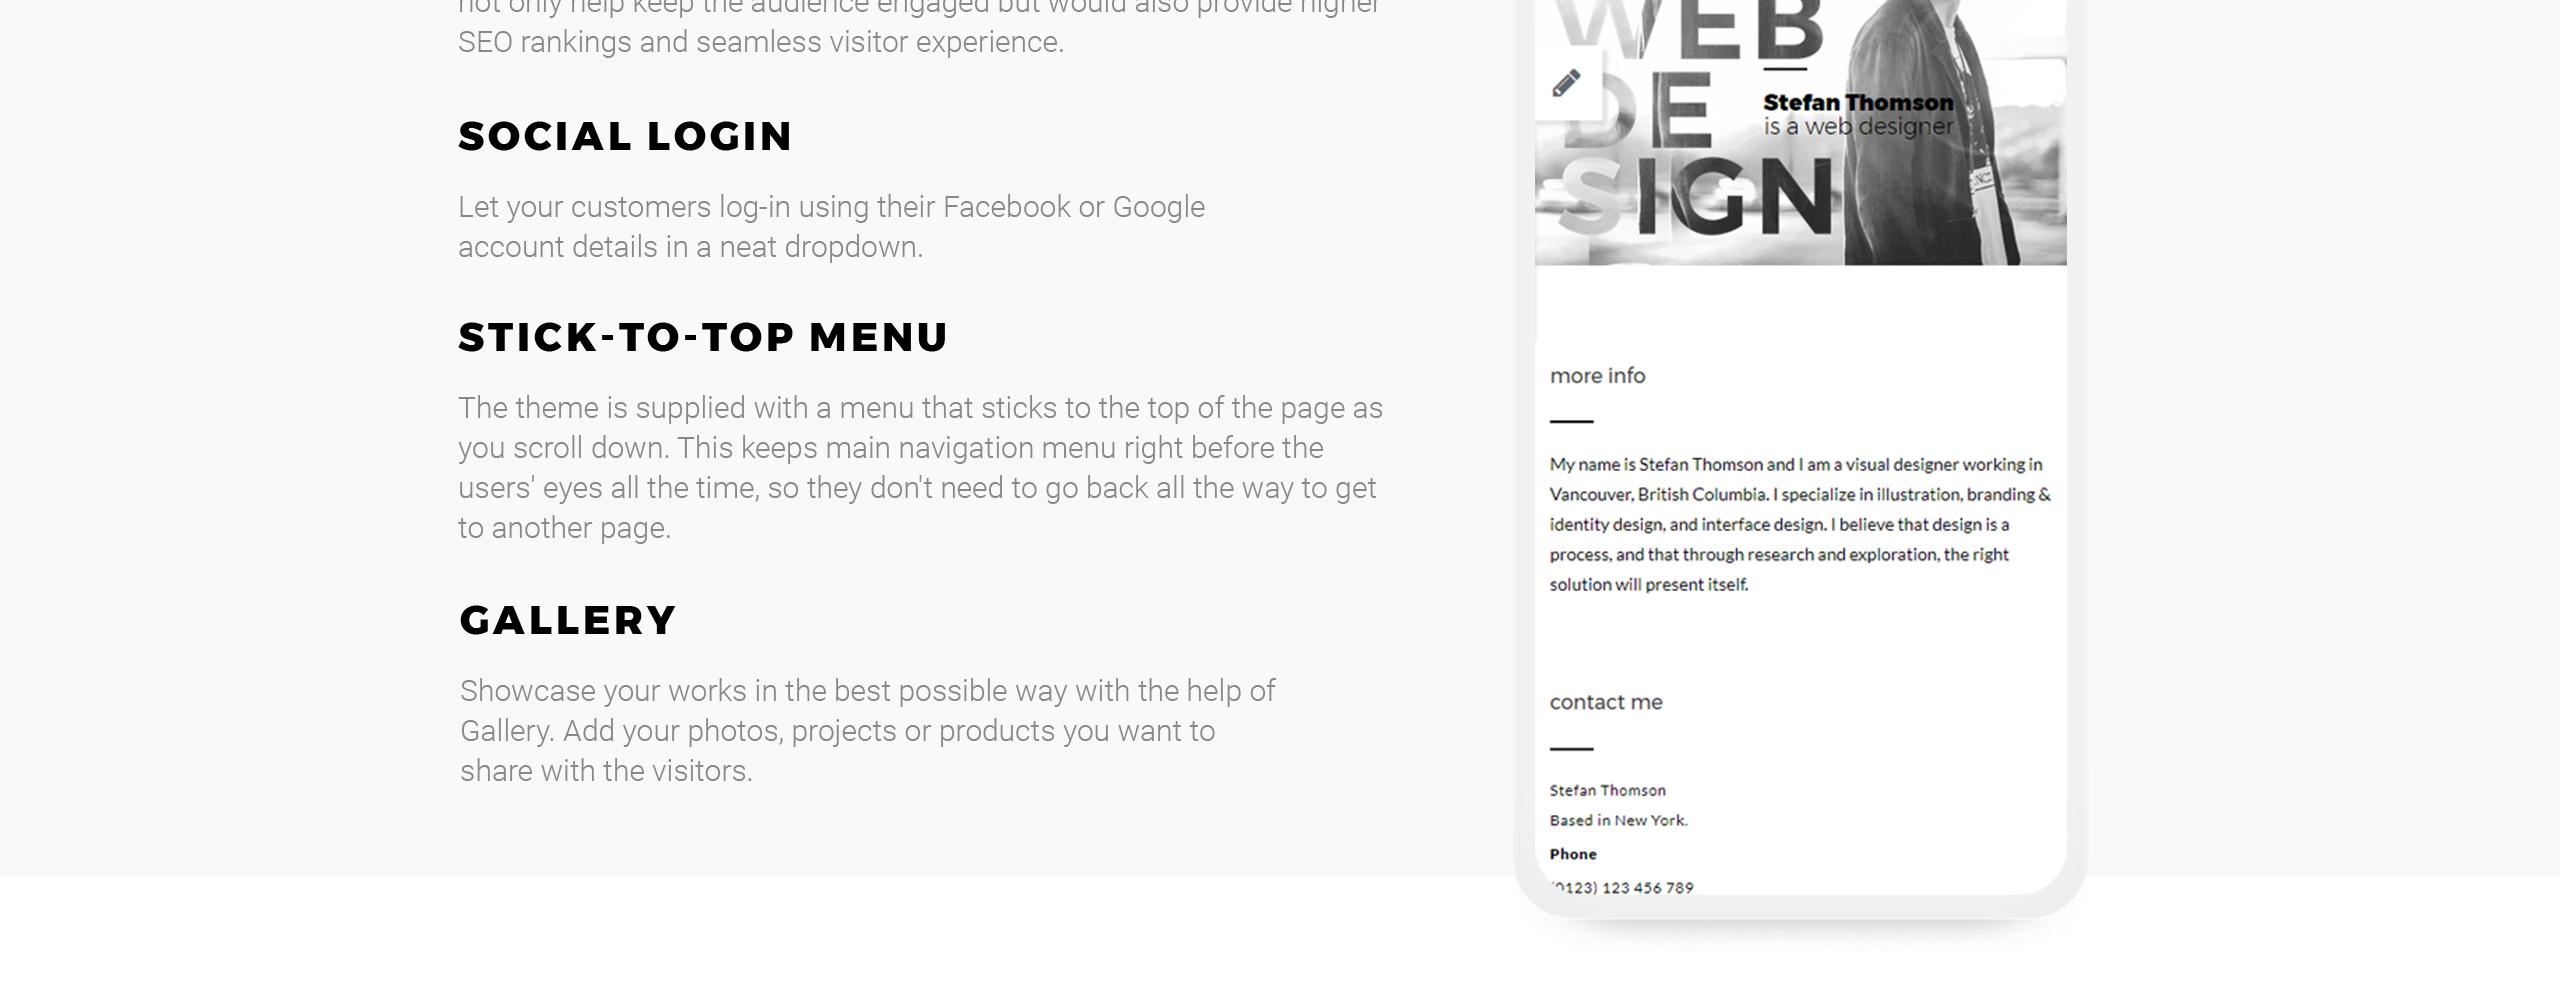 Website Design Template 67286 - blog portfolio photographer project business service video videographer studio agency